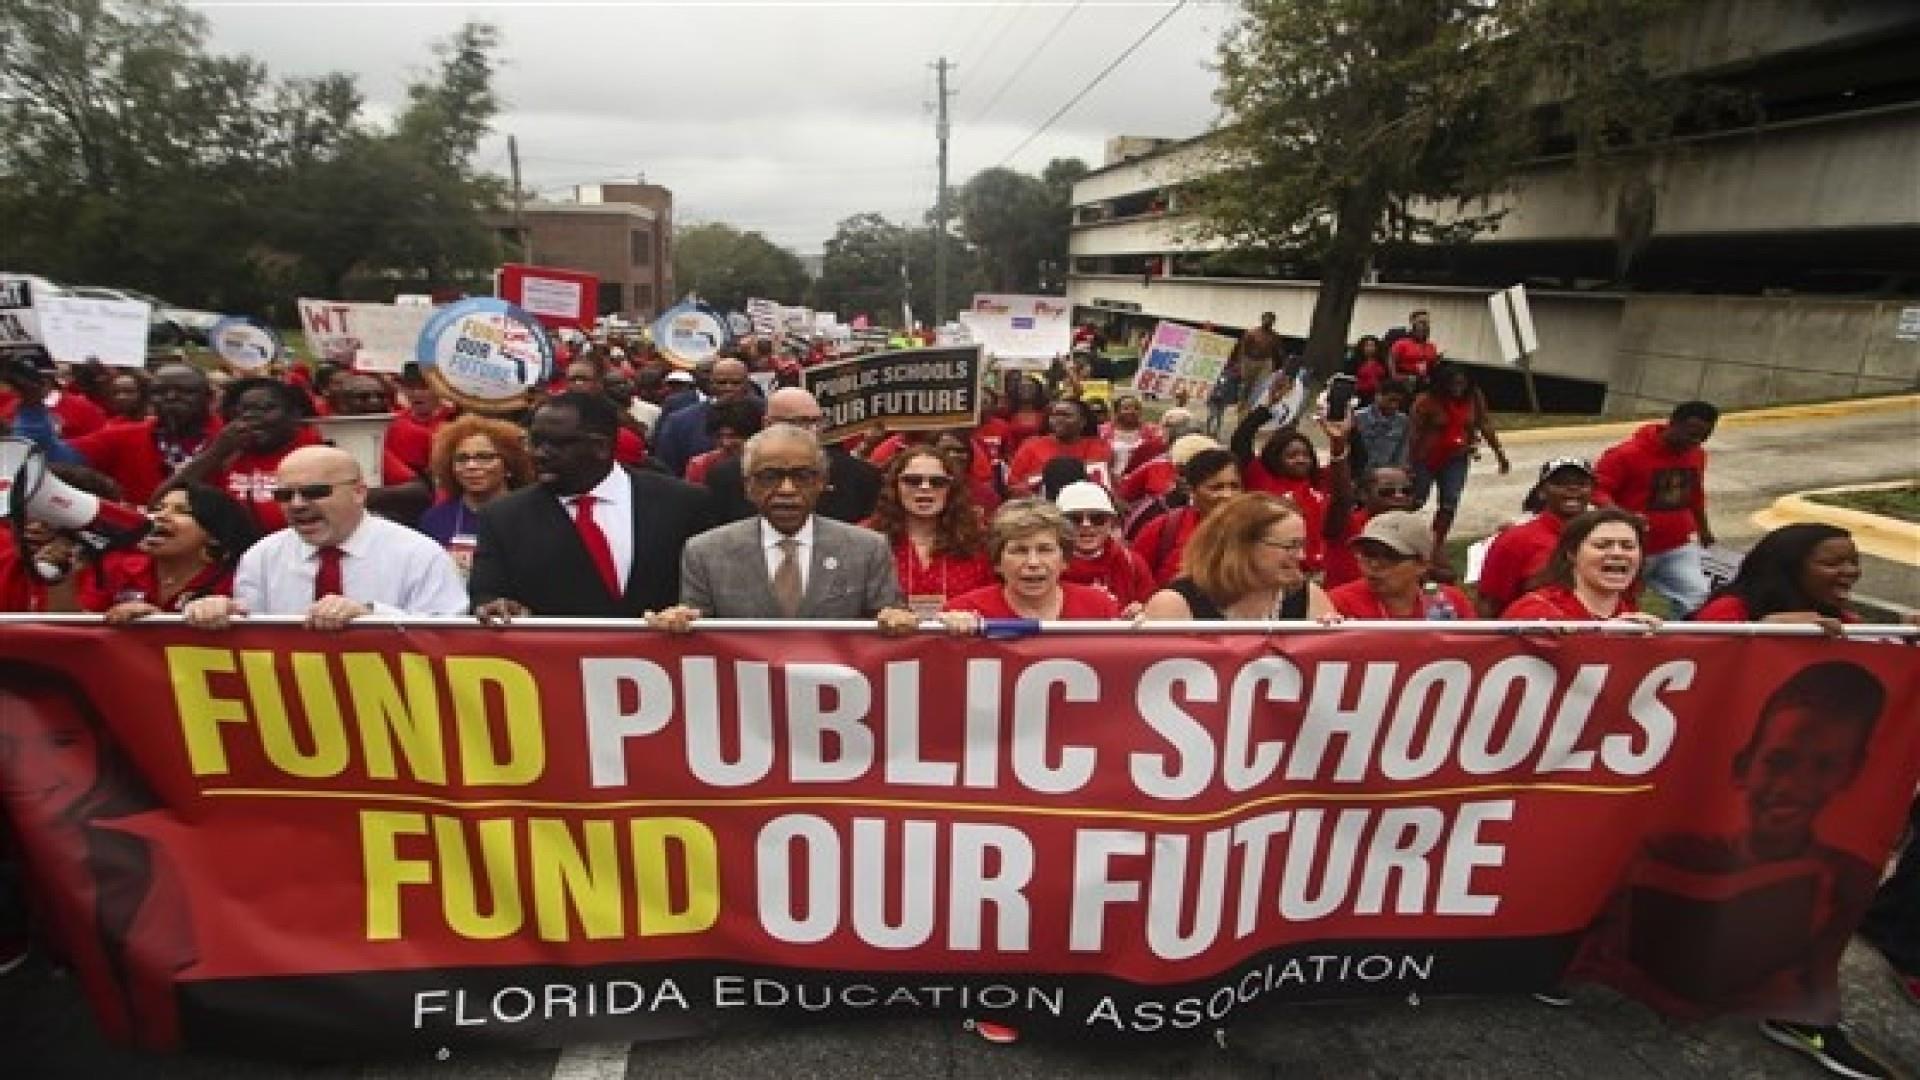 Teachers' pay in Florida